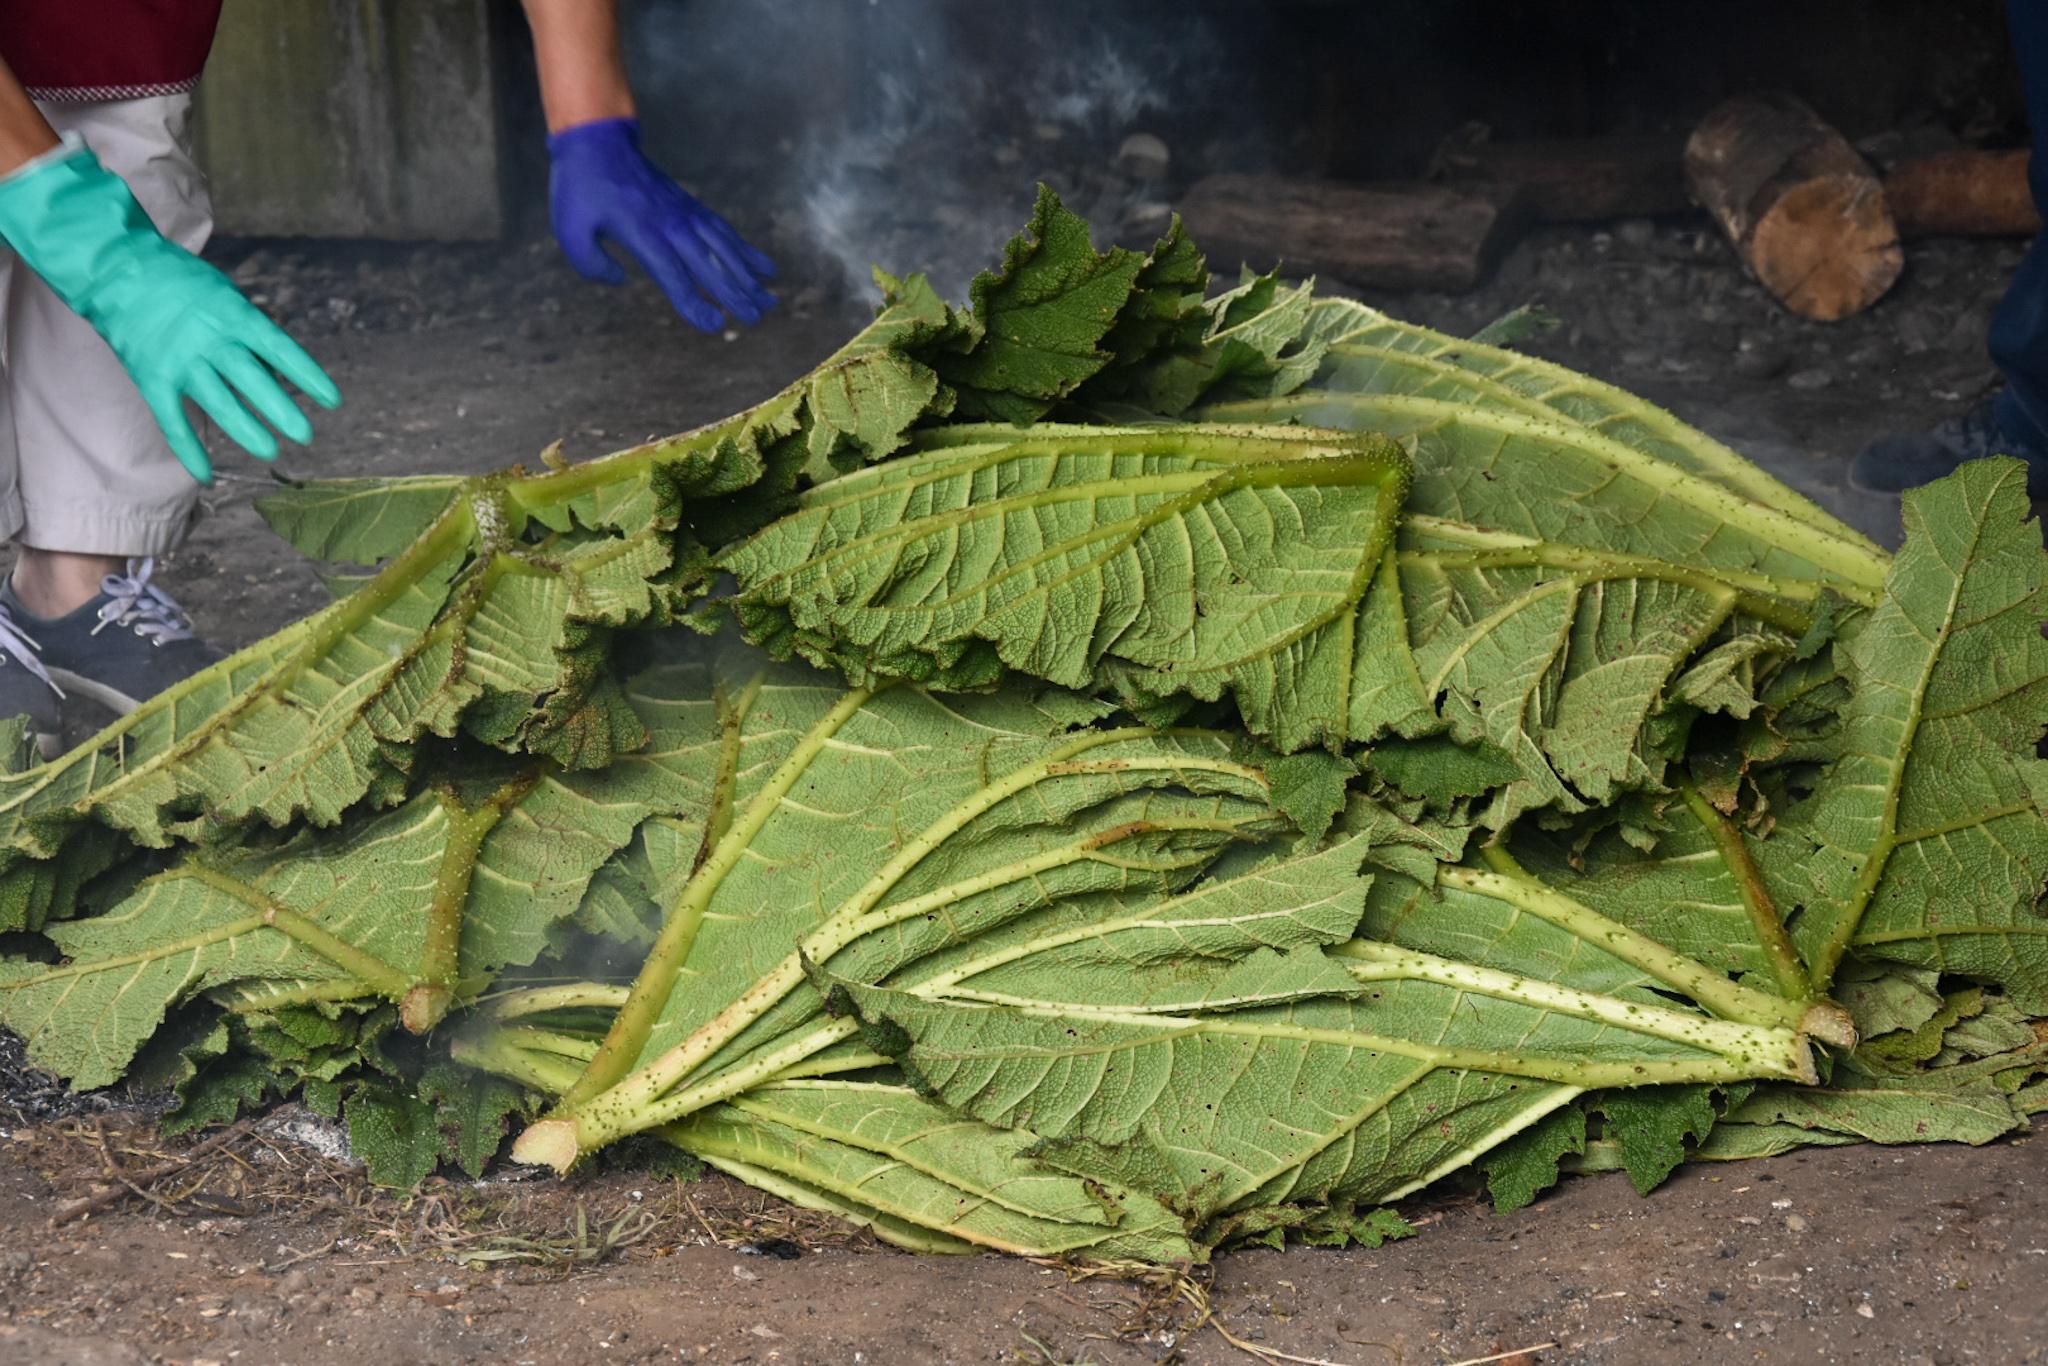 preparing curanto on Chiloe island